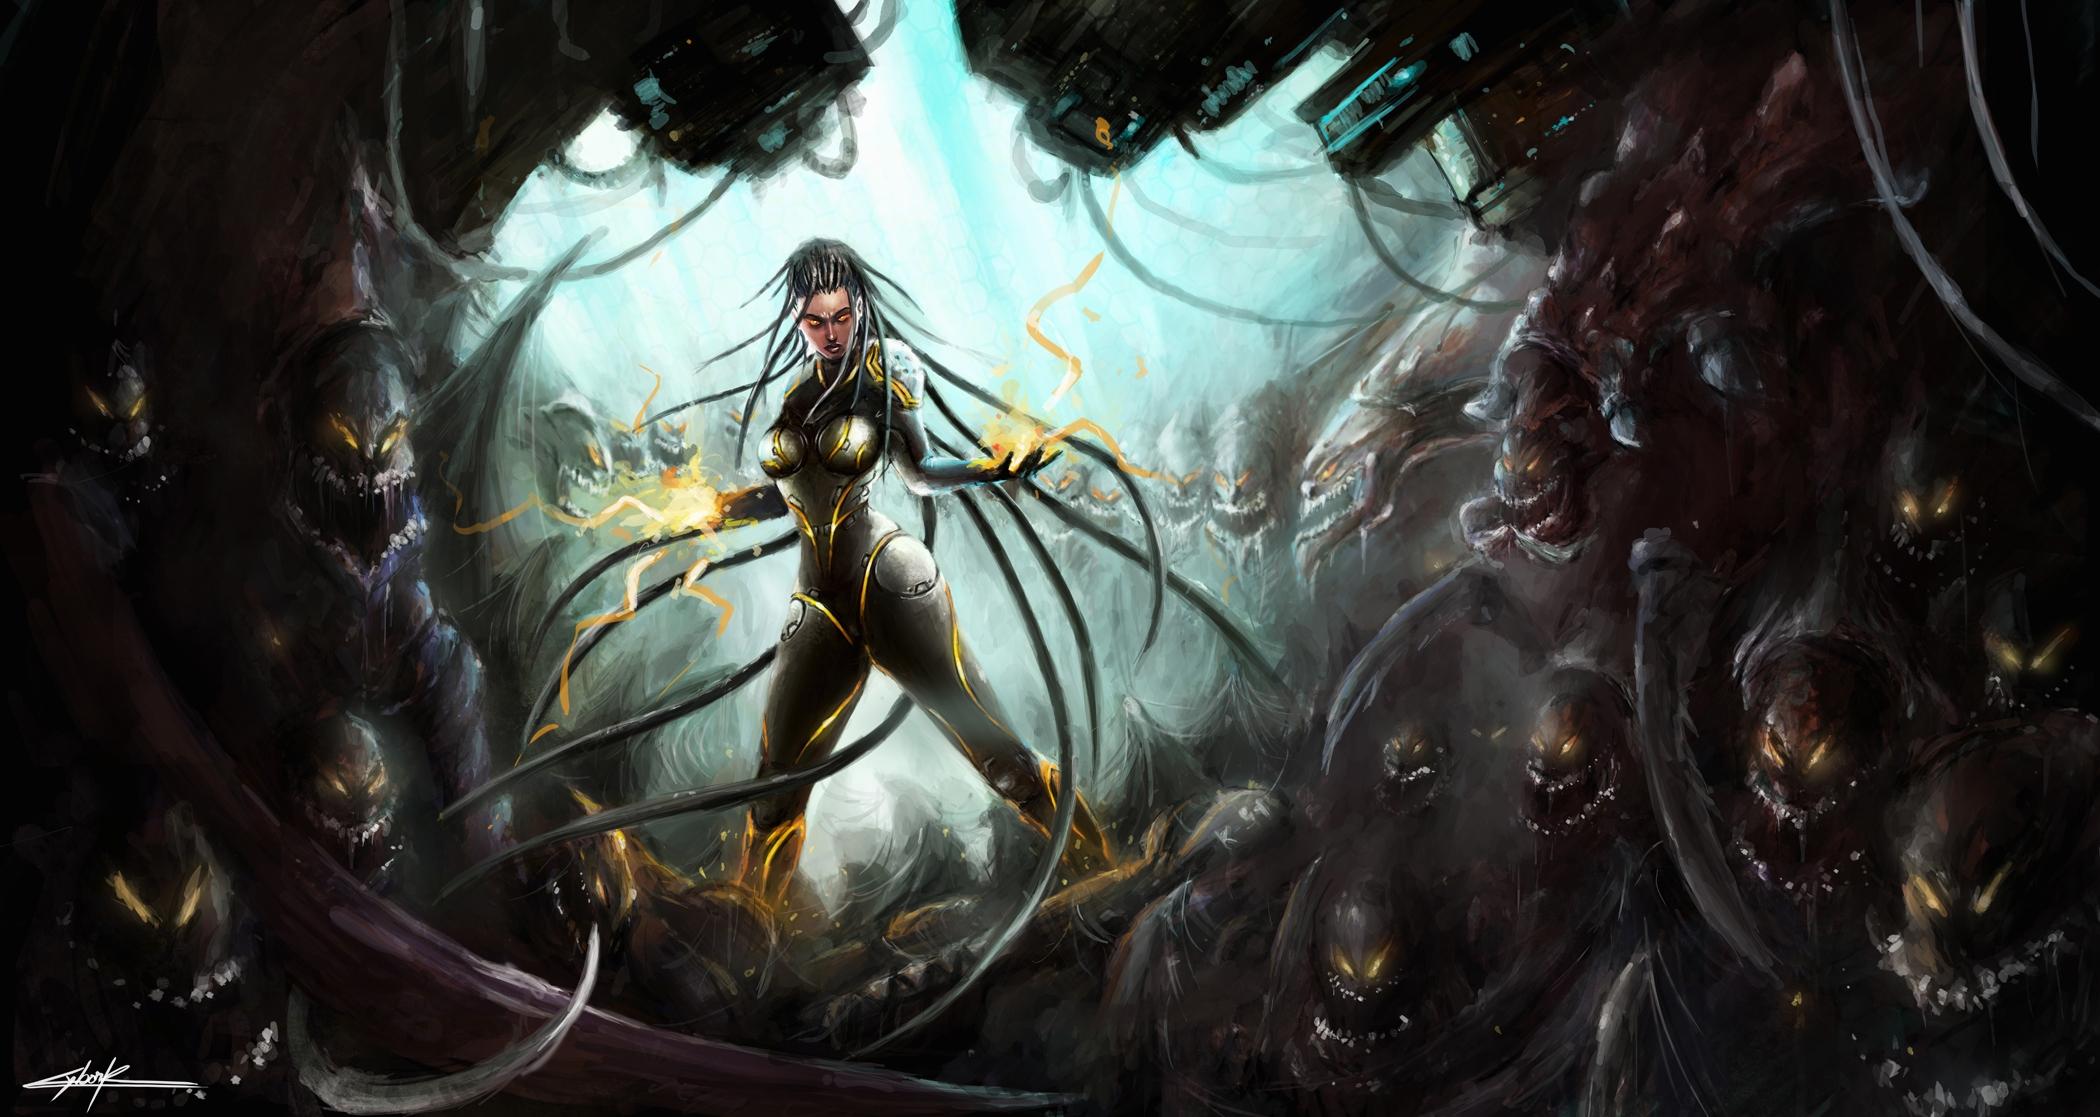 Starcraft ii heart of the swarm full hd wallpaper and - Sarah kerrigan wallpaper ...